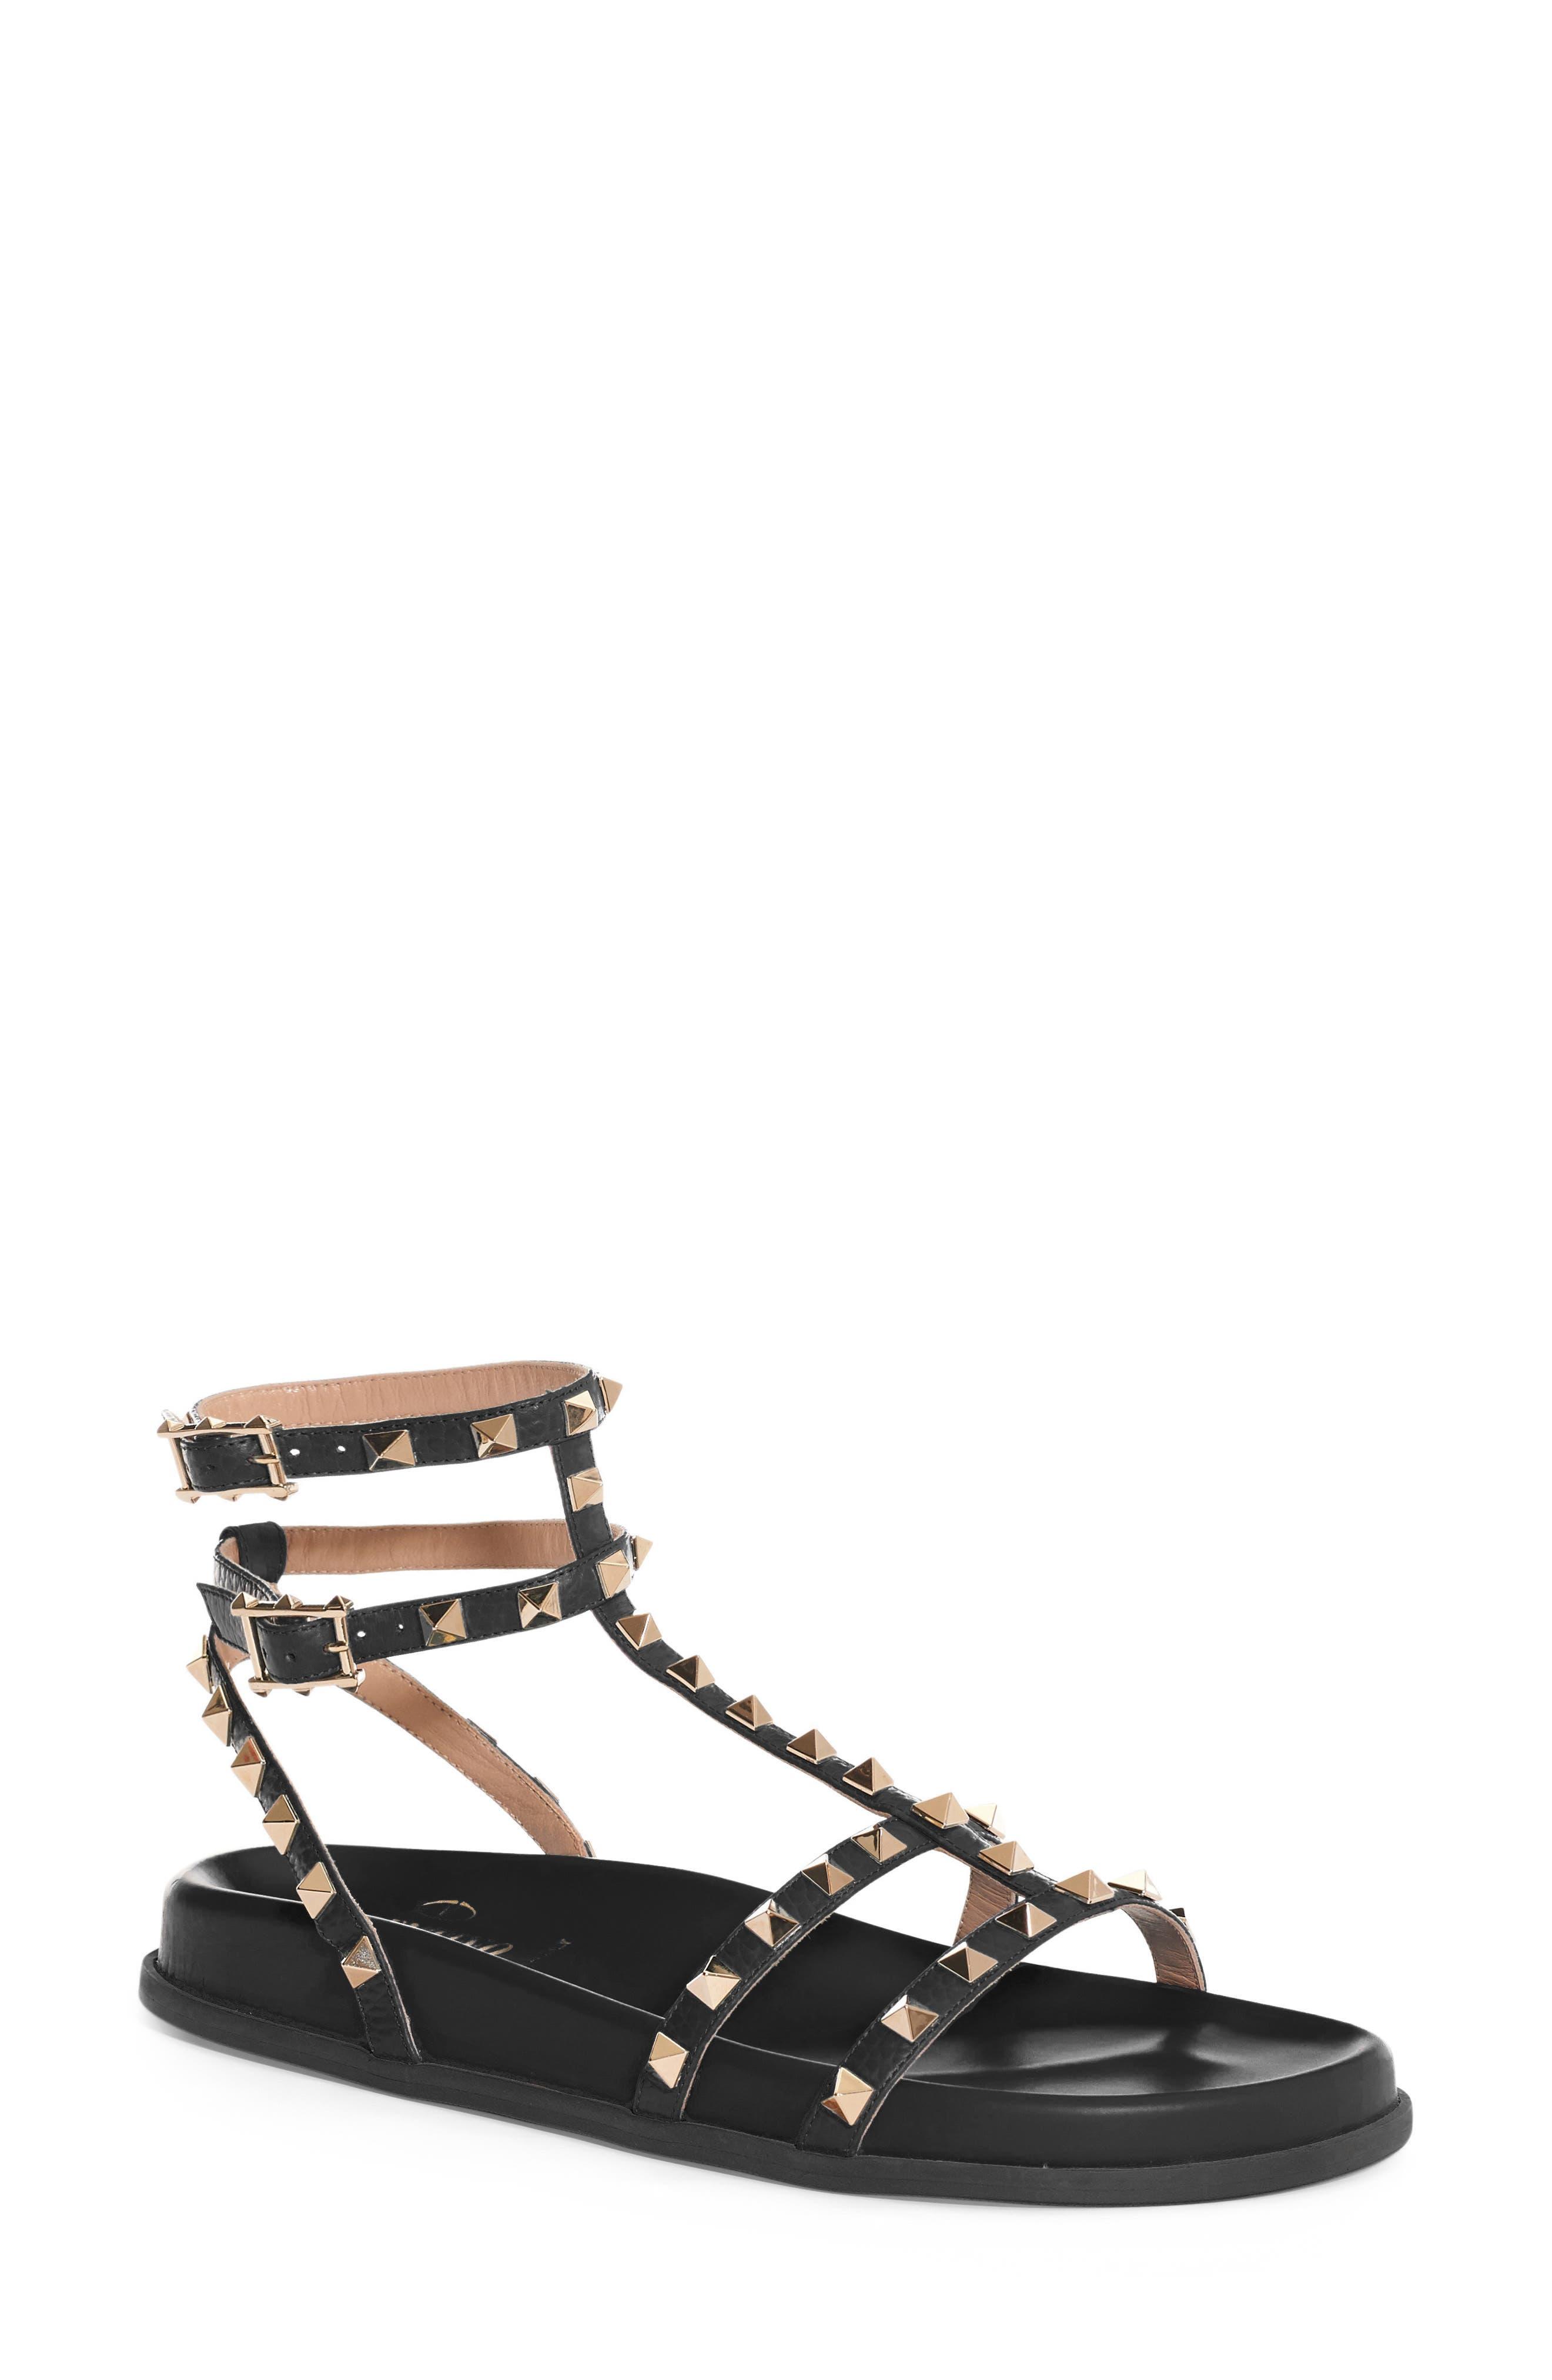 Main Image - VALENTINO GARAVANI Rockstud Flatform Sandal (Women)